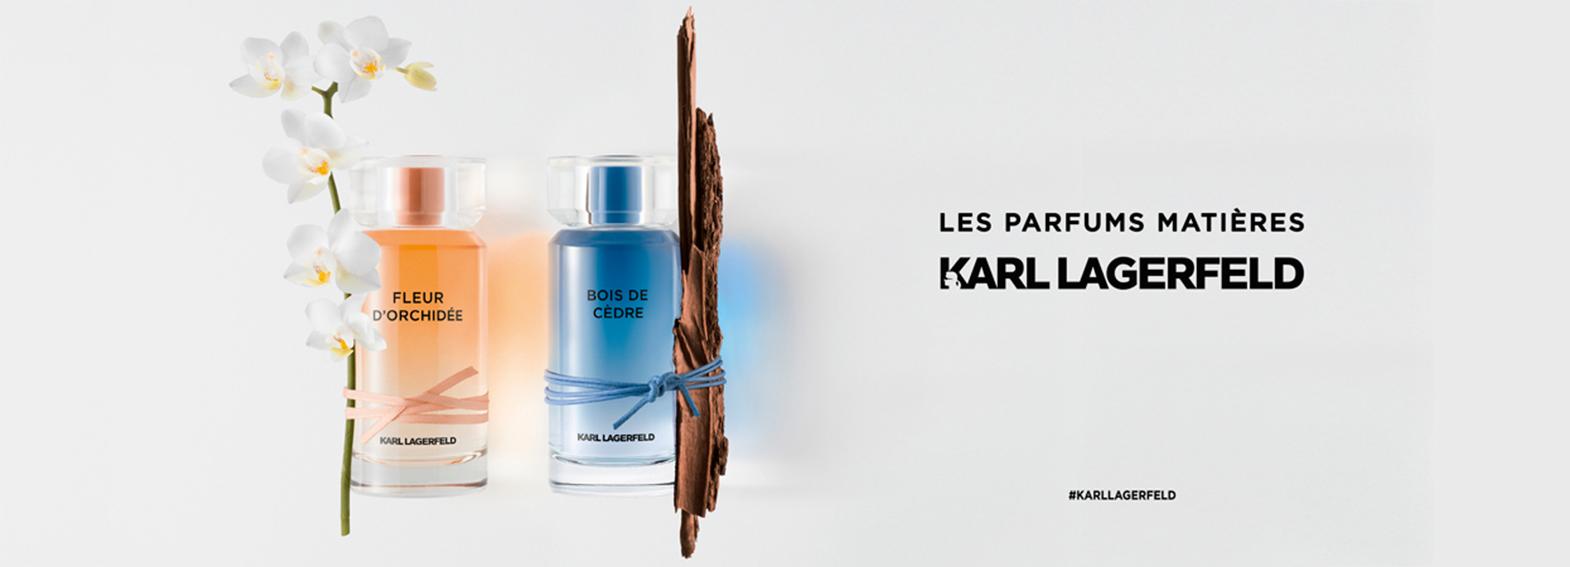 Karl Lagerfeld | Lave priser | Rask levering | Bangerhead